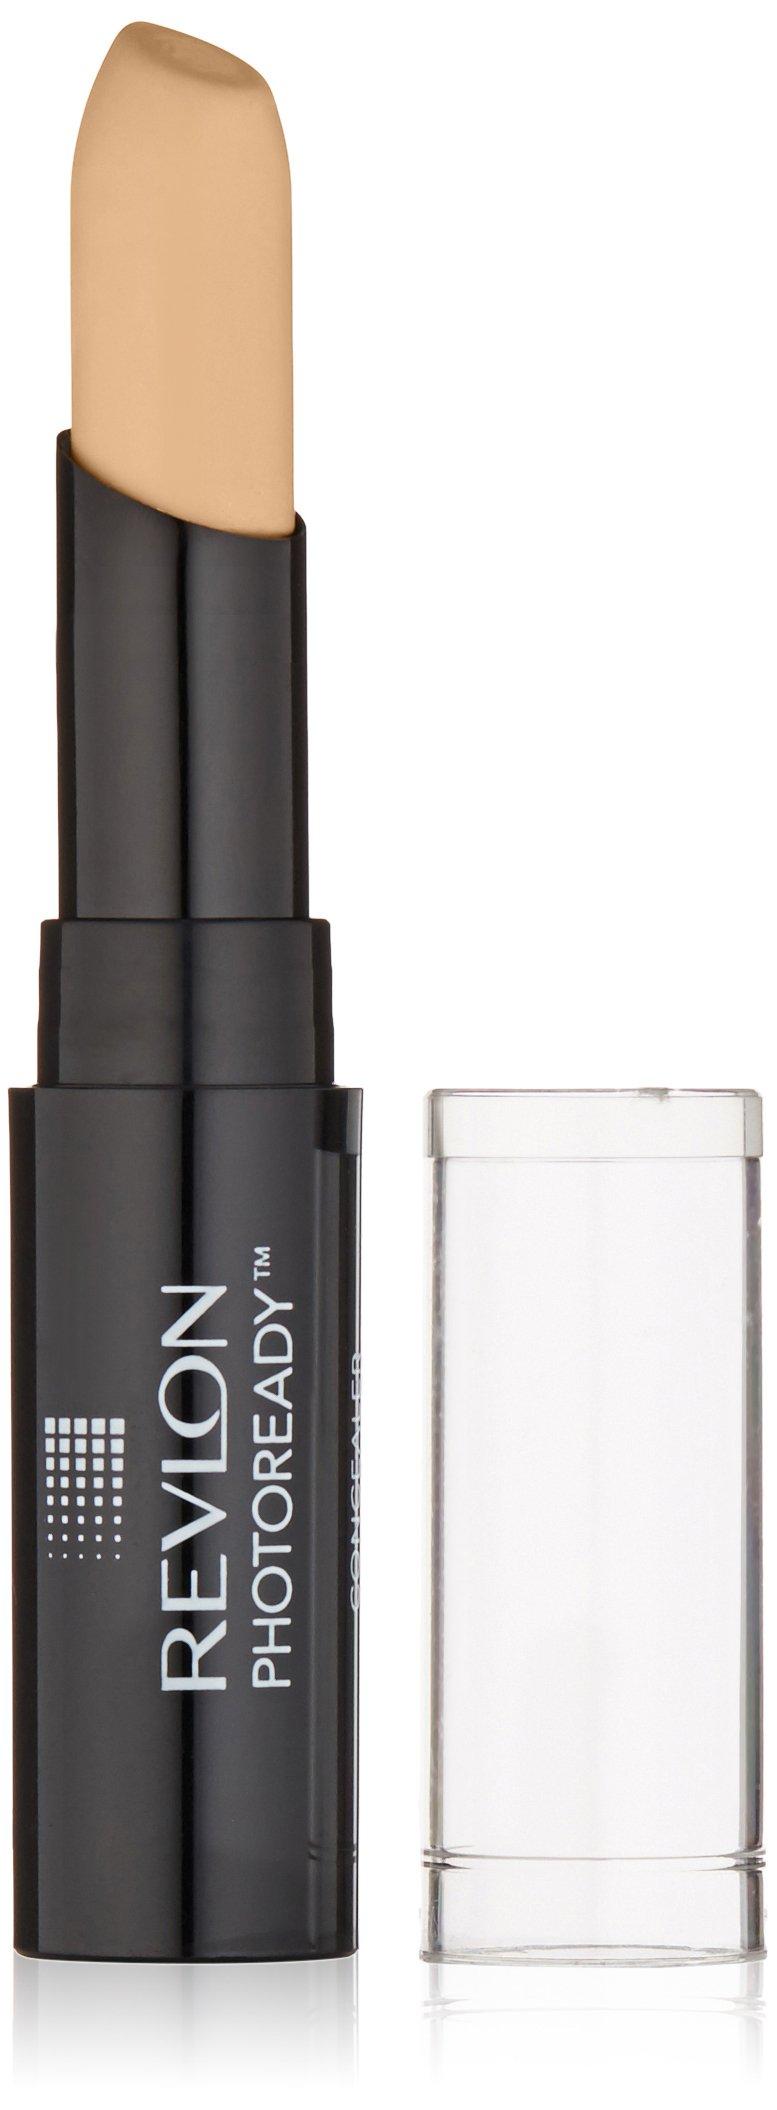 Revlon Photoready Concealer, Light Medium, 0.11 Oz